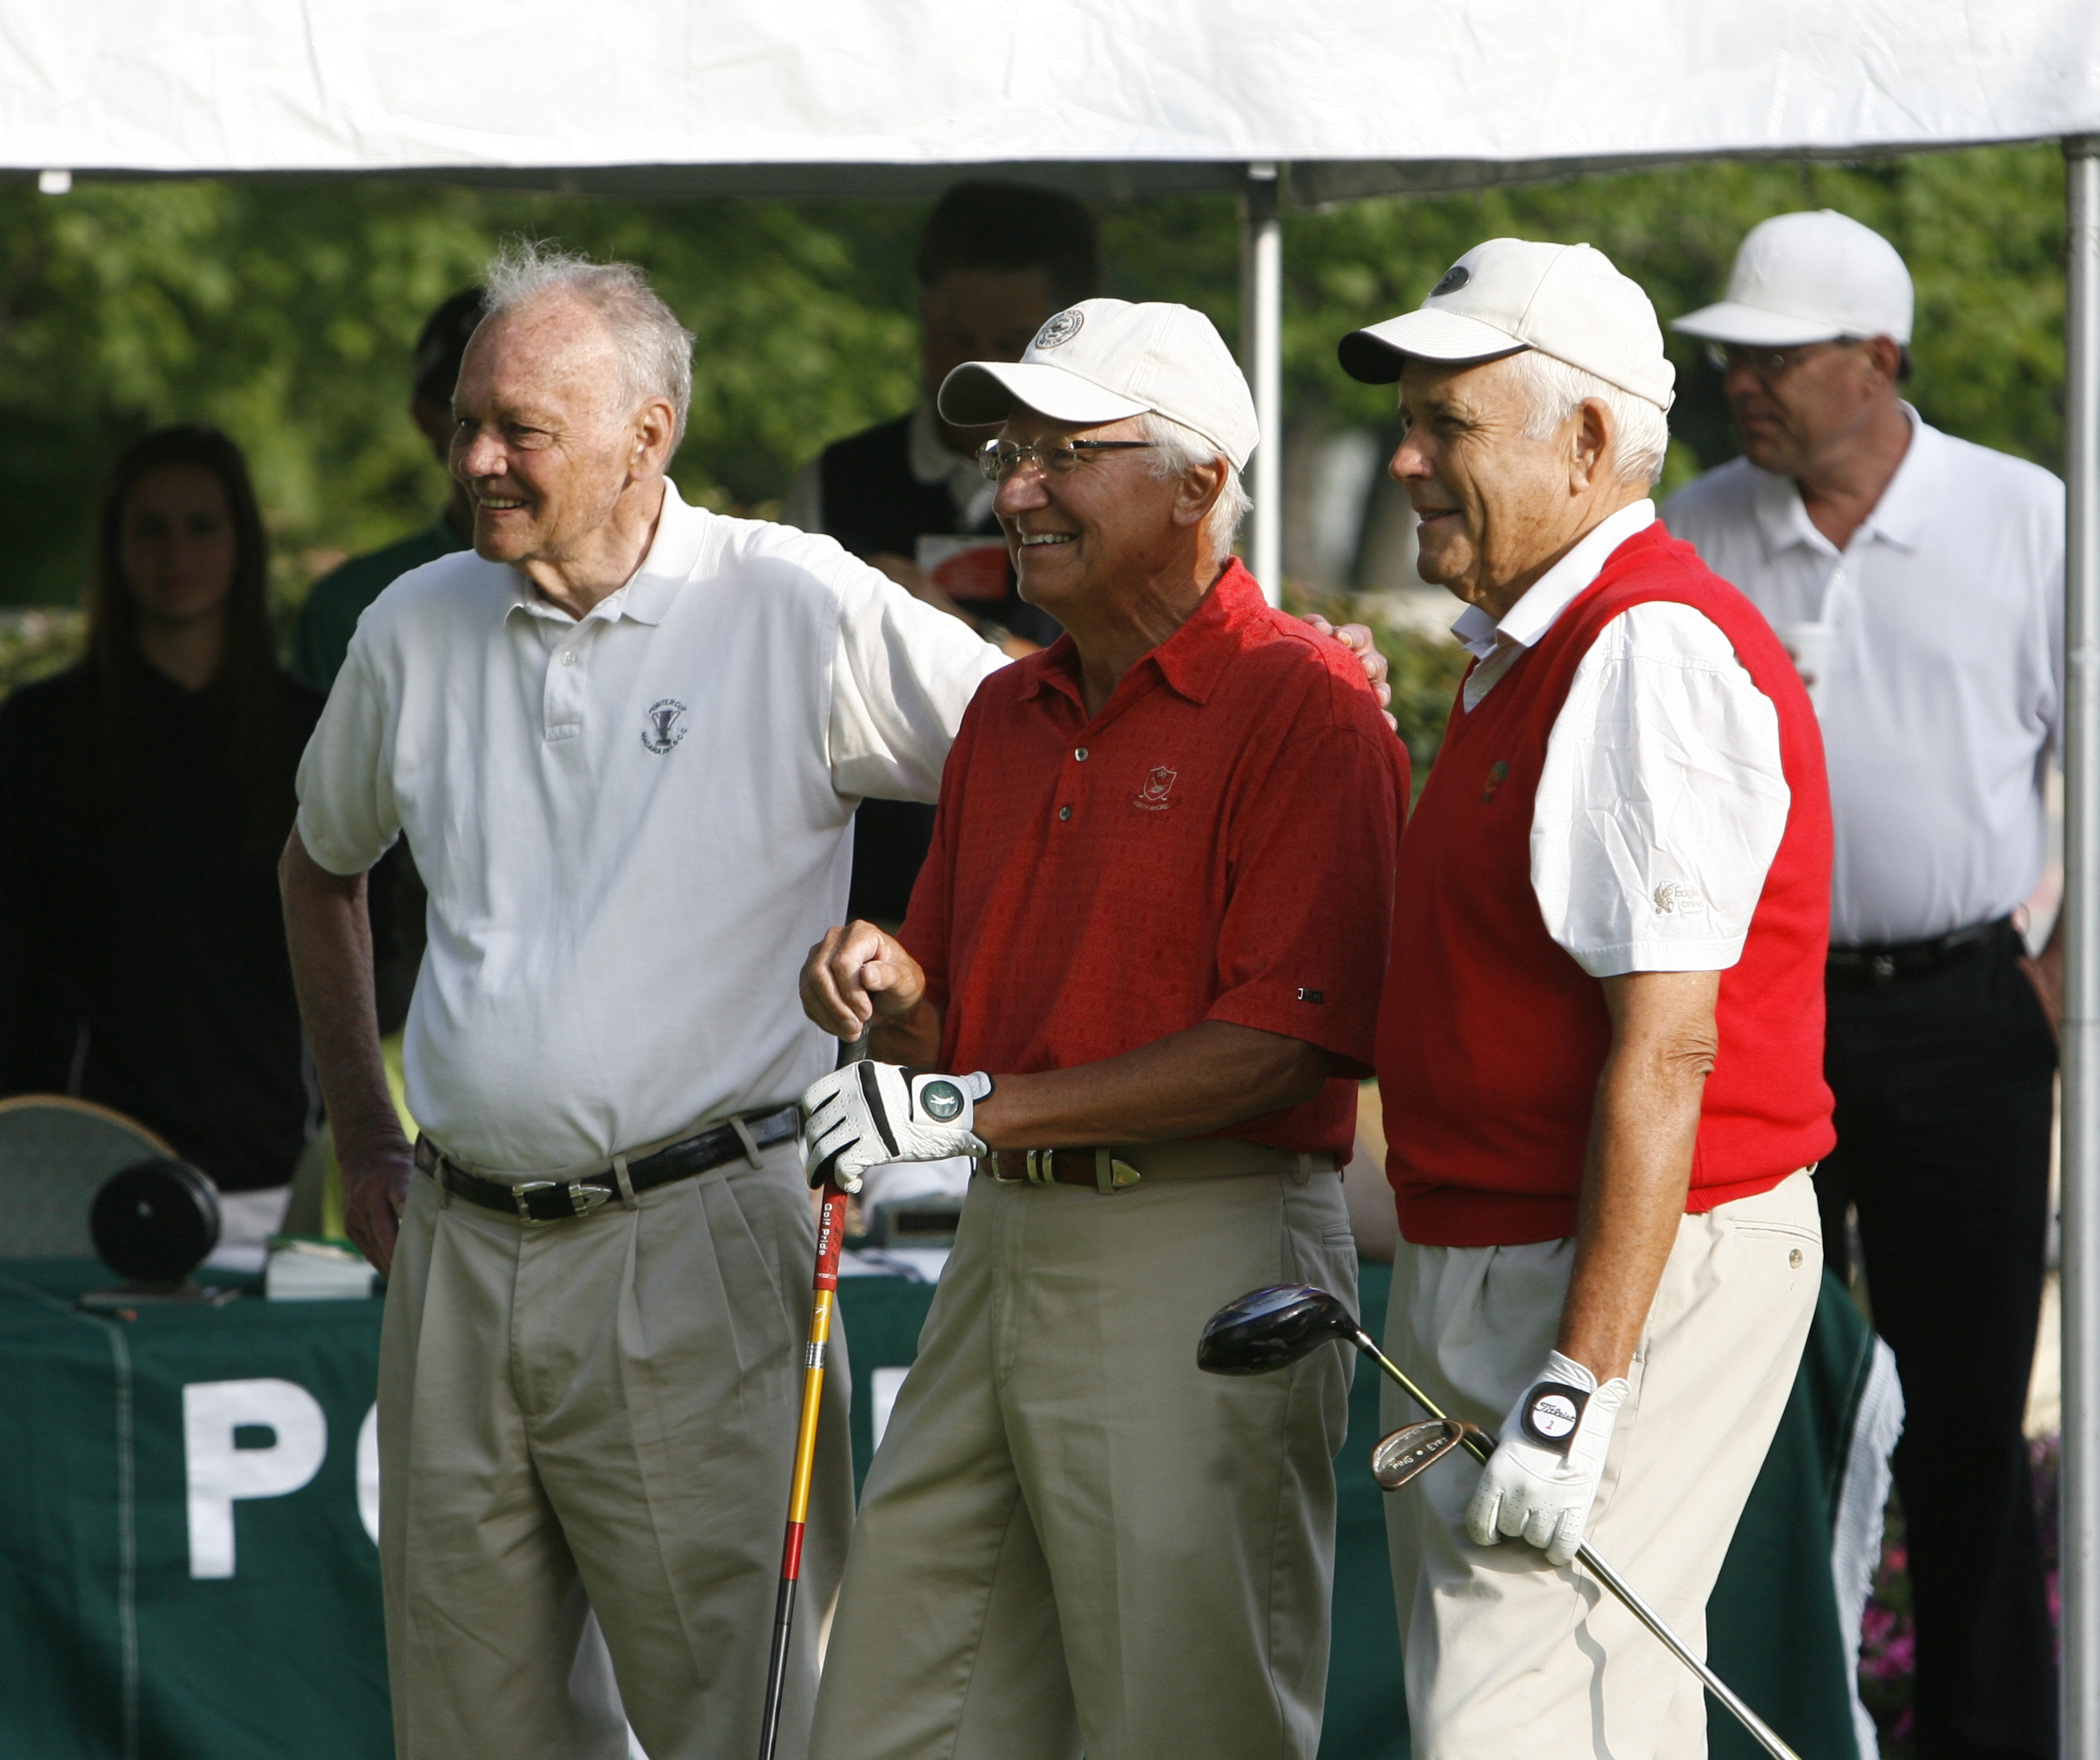 From left, Bill Ward, John Konsek and Ward Wettlaufer hit ceremonial tee shots at the 2008 Porter Cup at Niagara Falls Country Club.